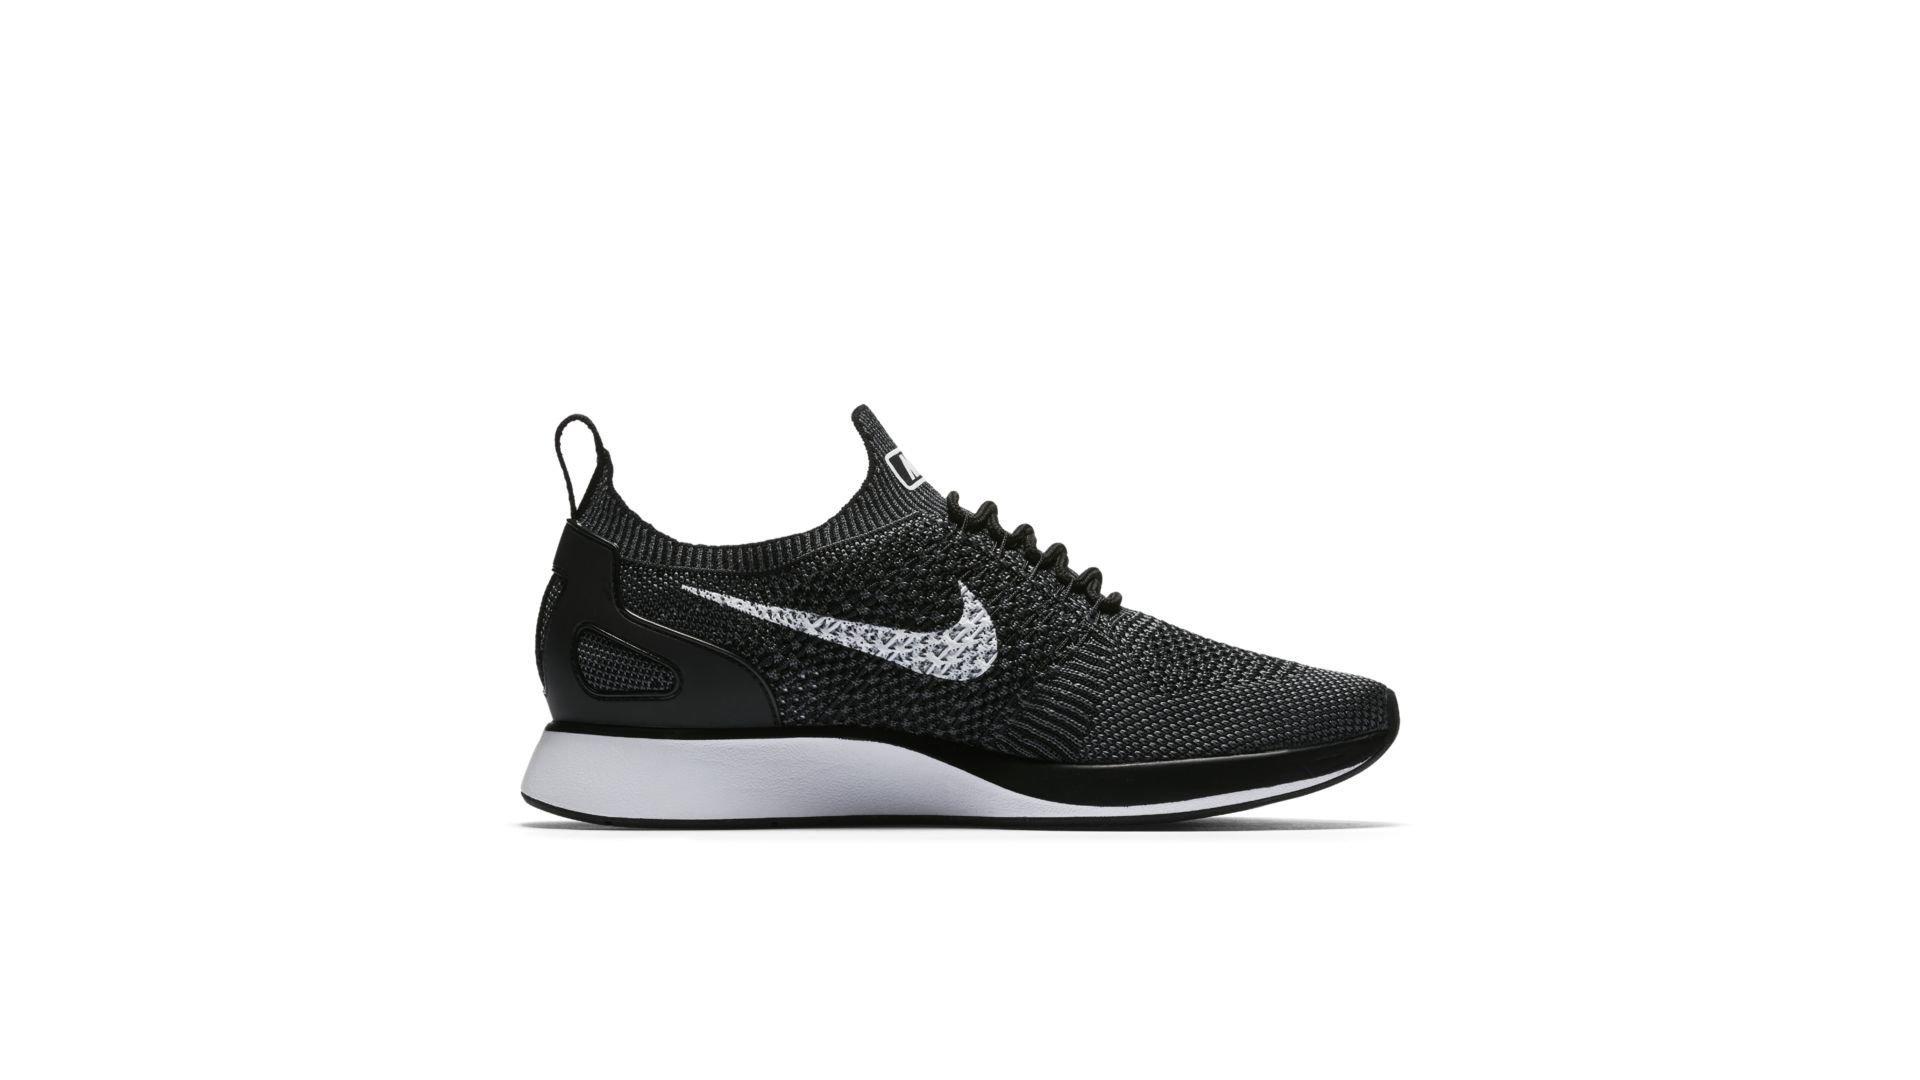 Nike Mariah Flyknit Racer Black White (W) (917658-002)